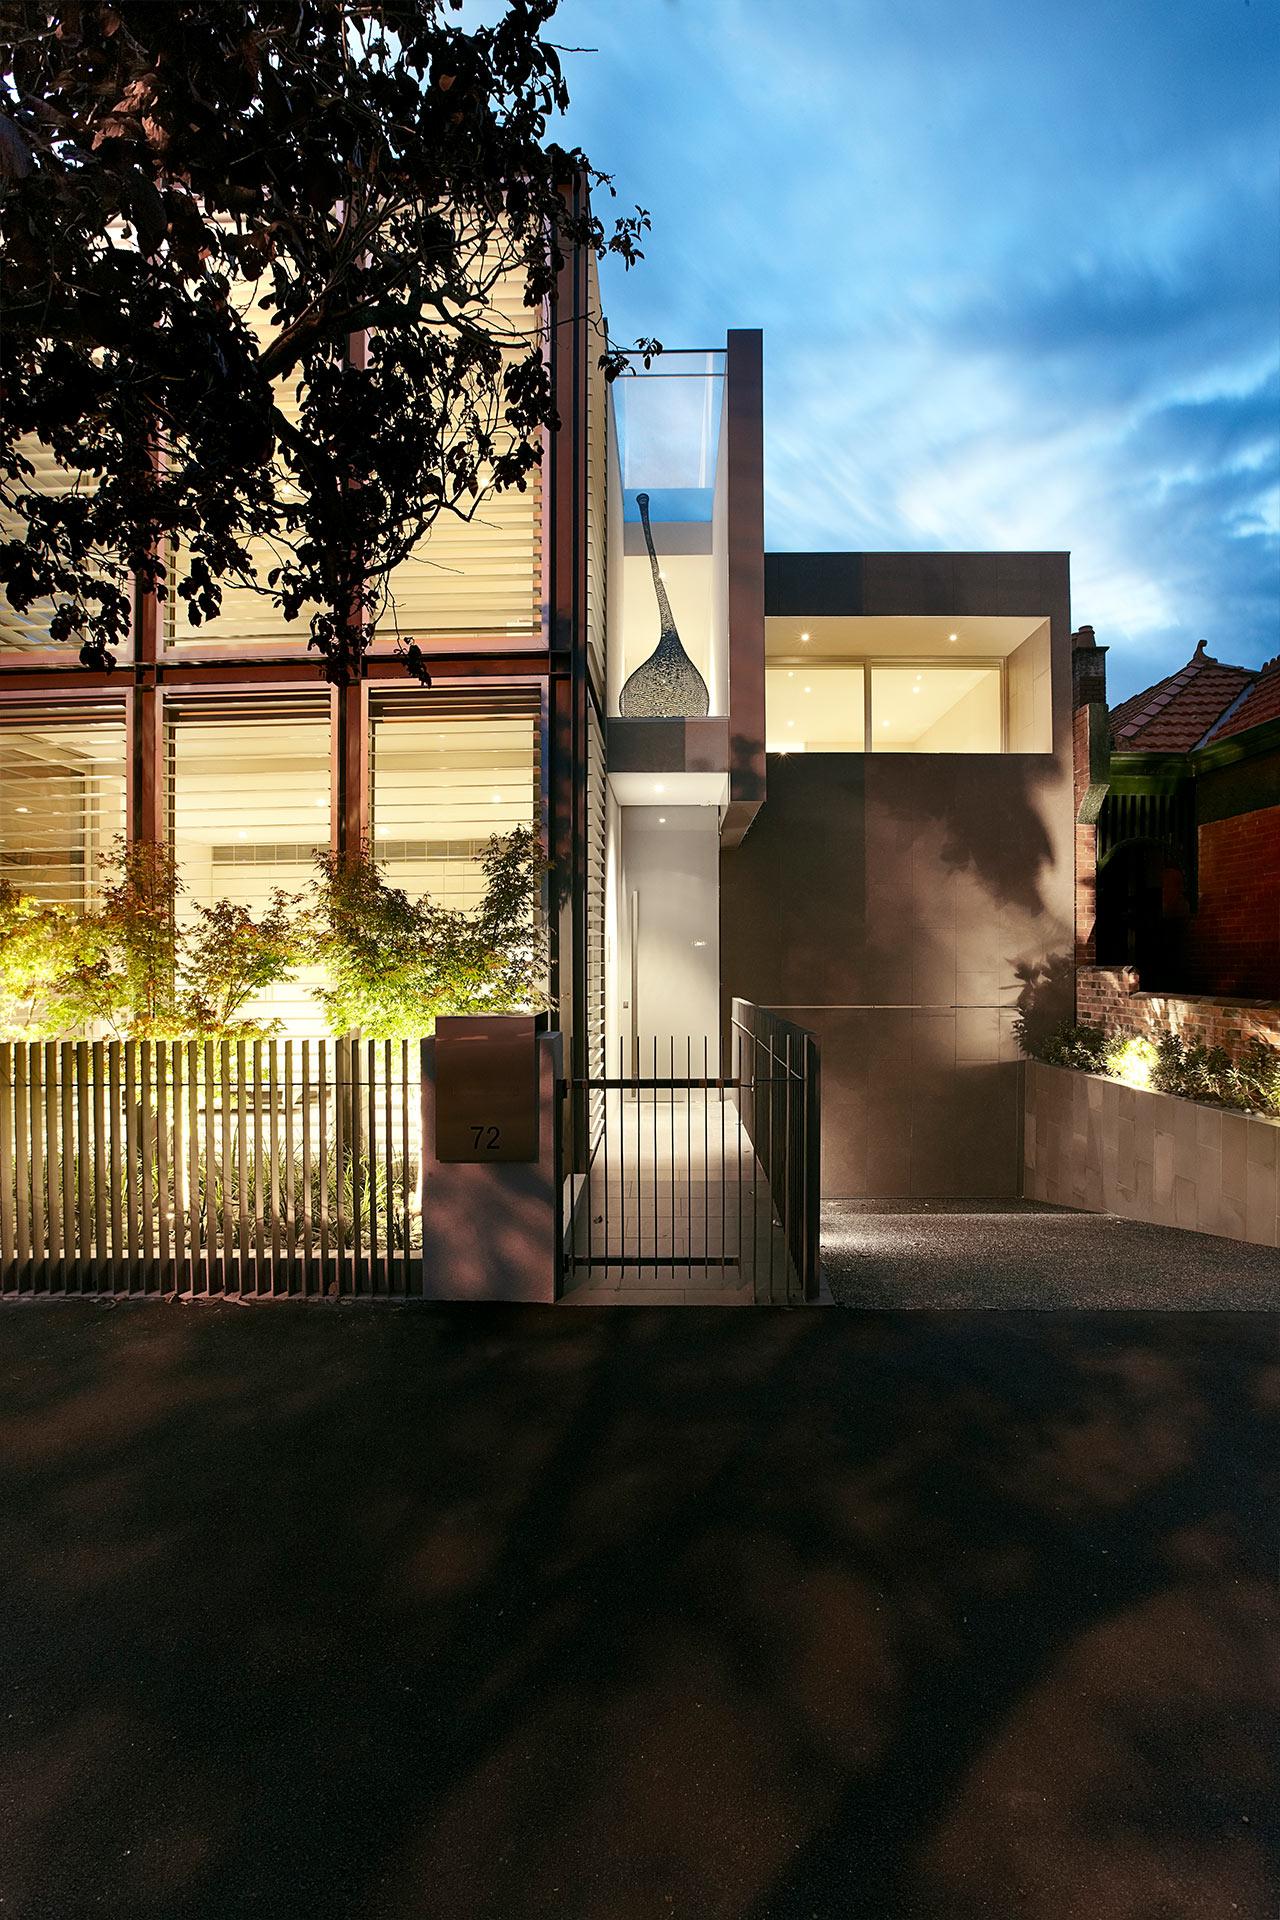 https://jamarchitects.com.au/wp-content/uploads/2021/07/JAM-Projects-Moubray-02-1280x1920-1.jpg